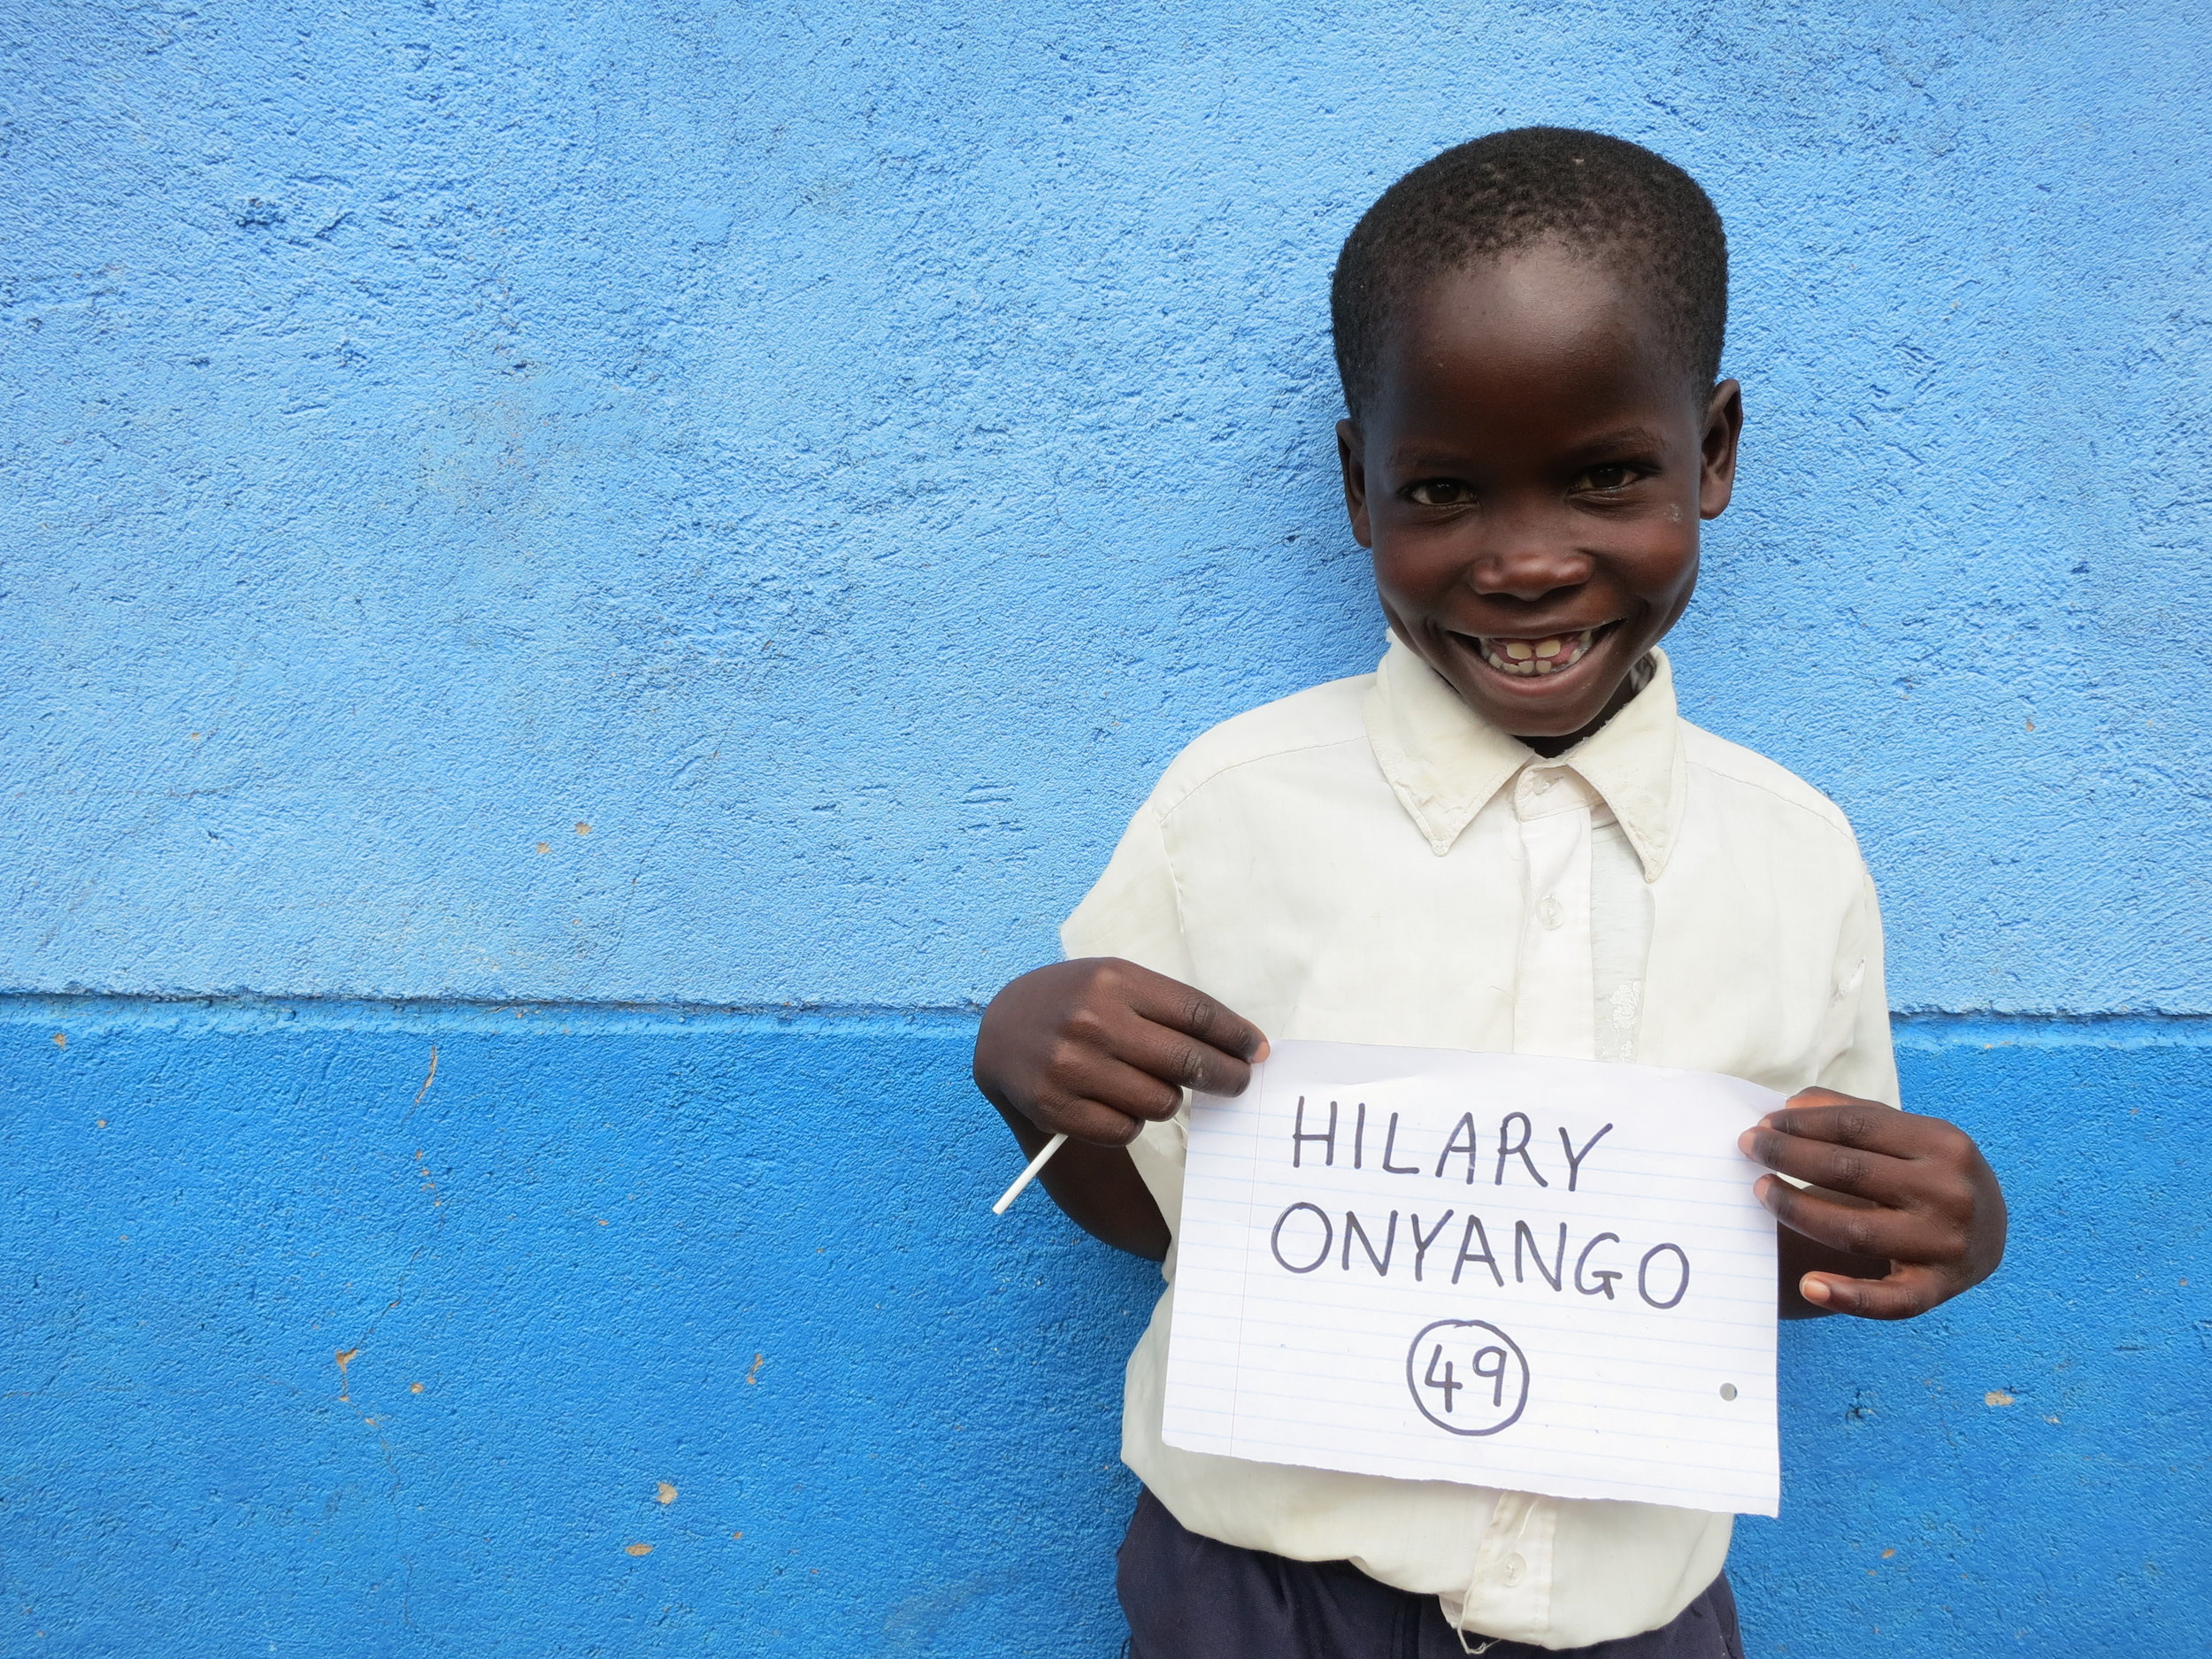 21 Hilary onyango.JPG